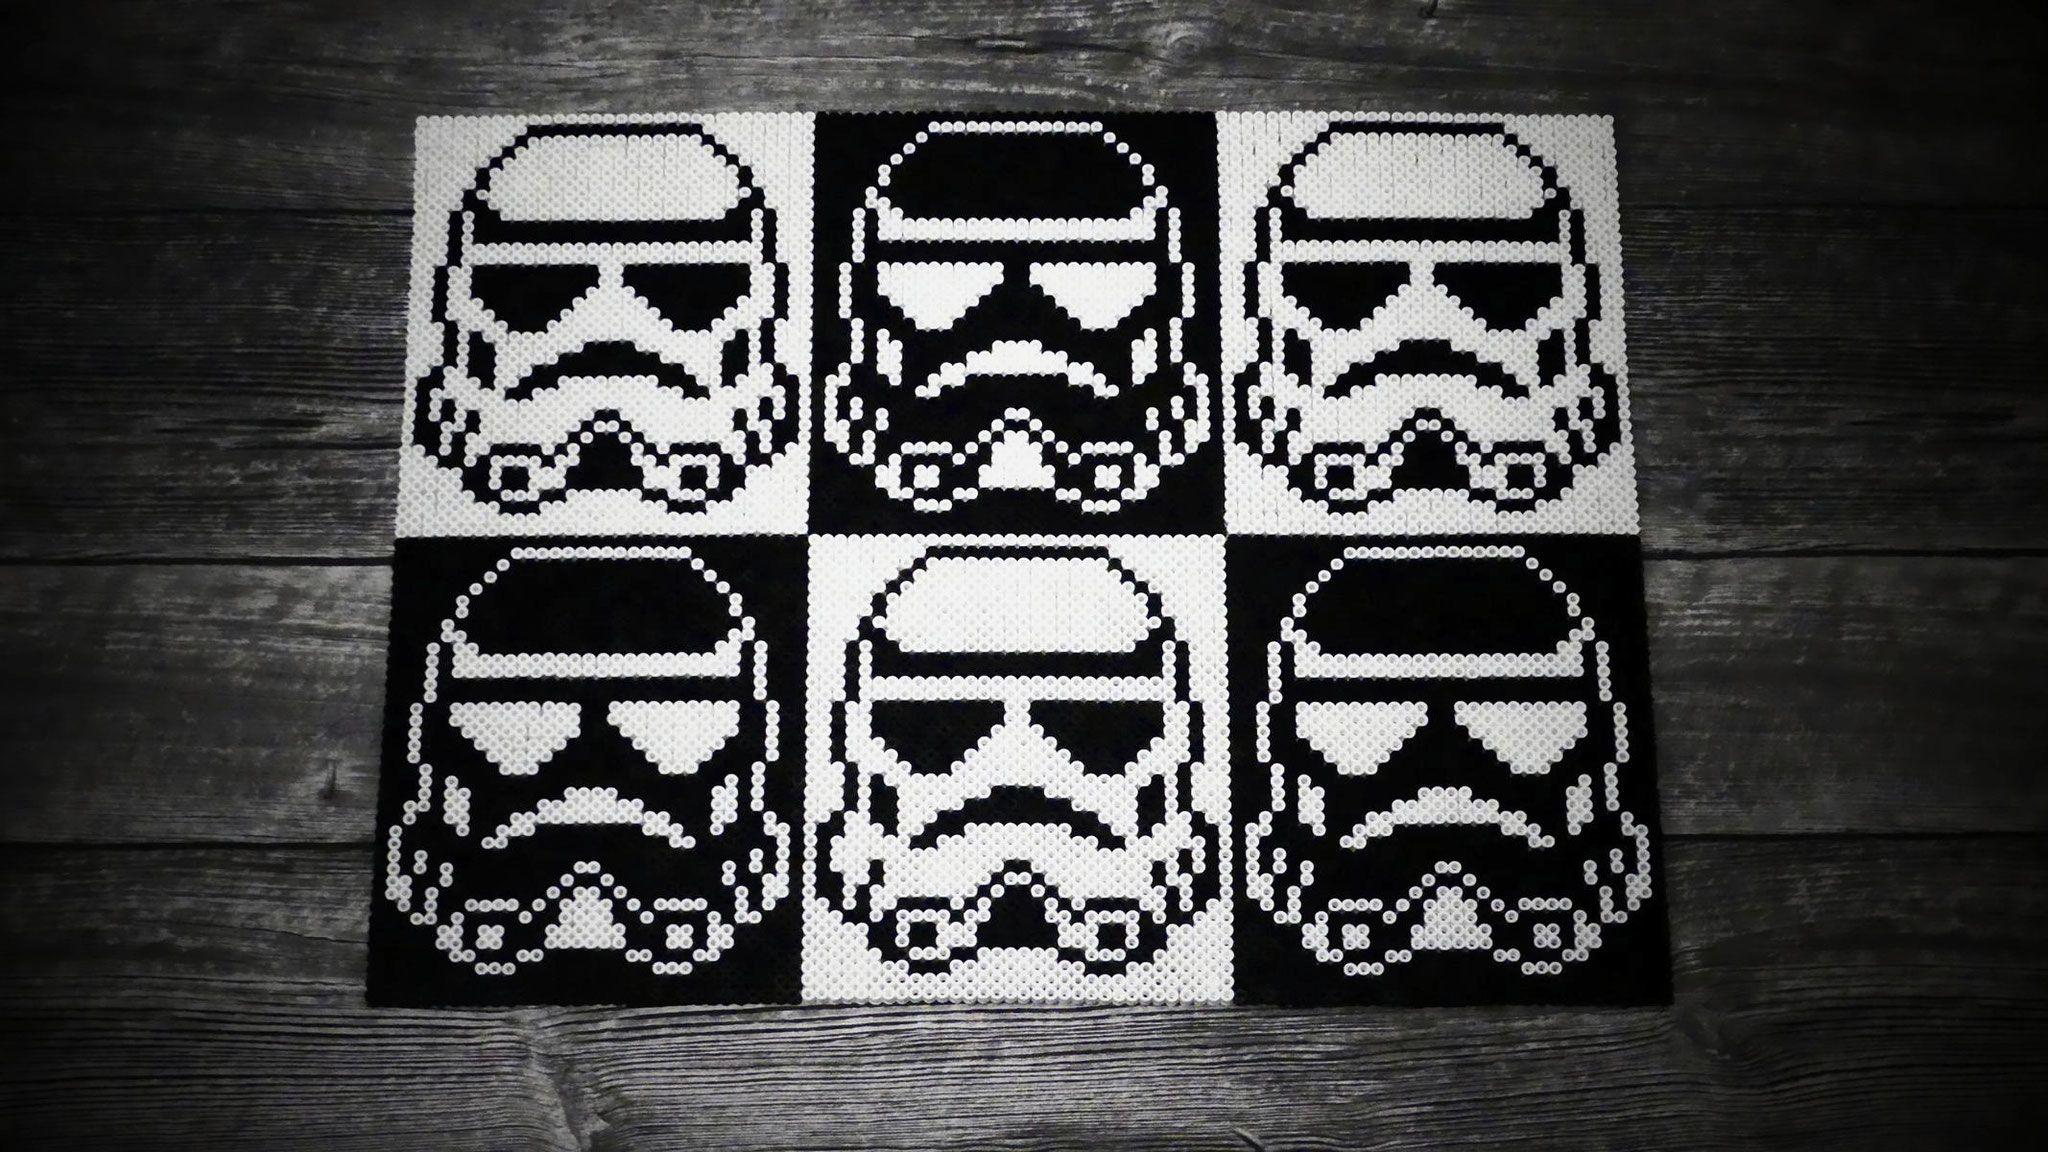 Star Wars The Force Awakens Captain Phasma Stormtrooper Bb8